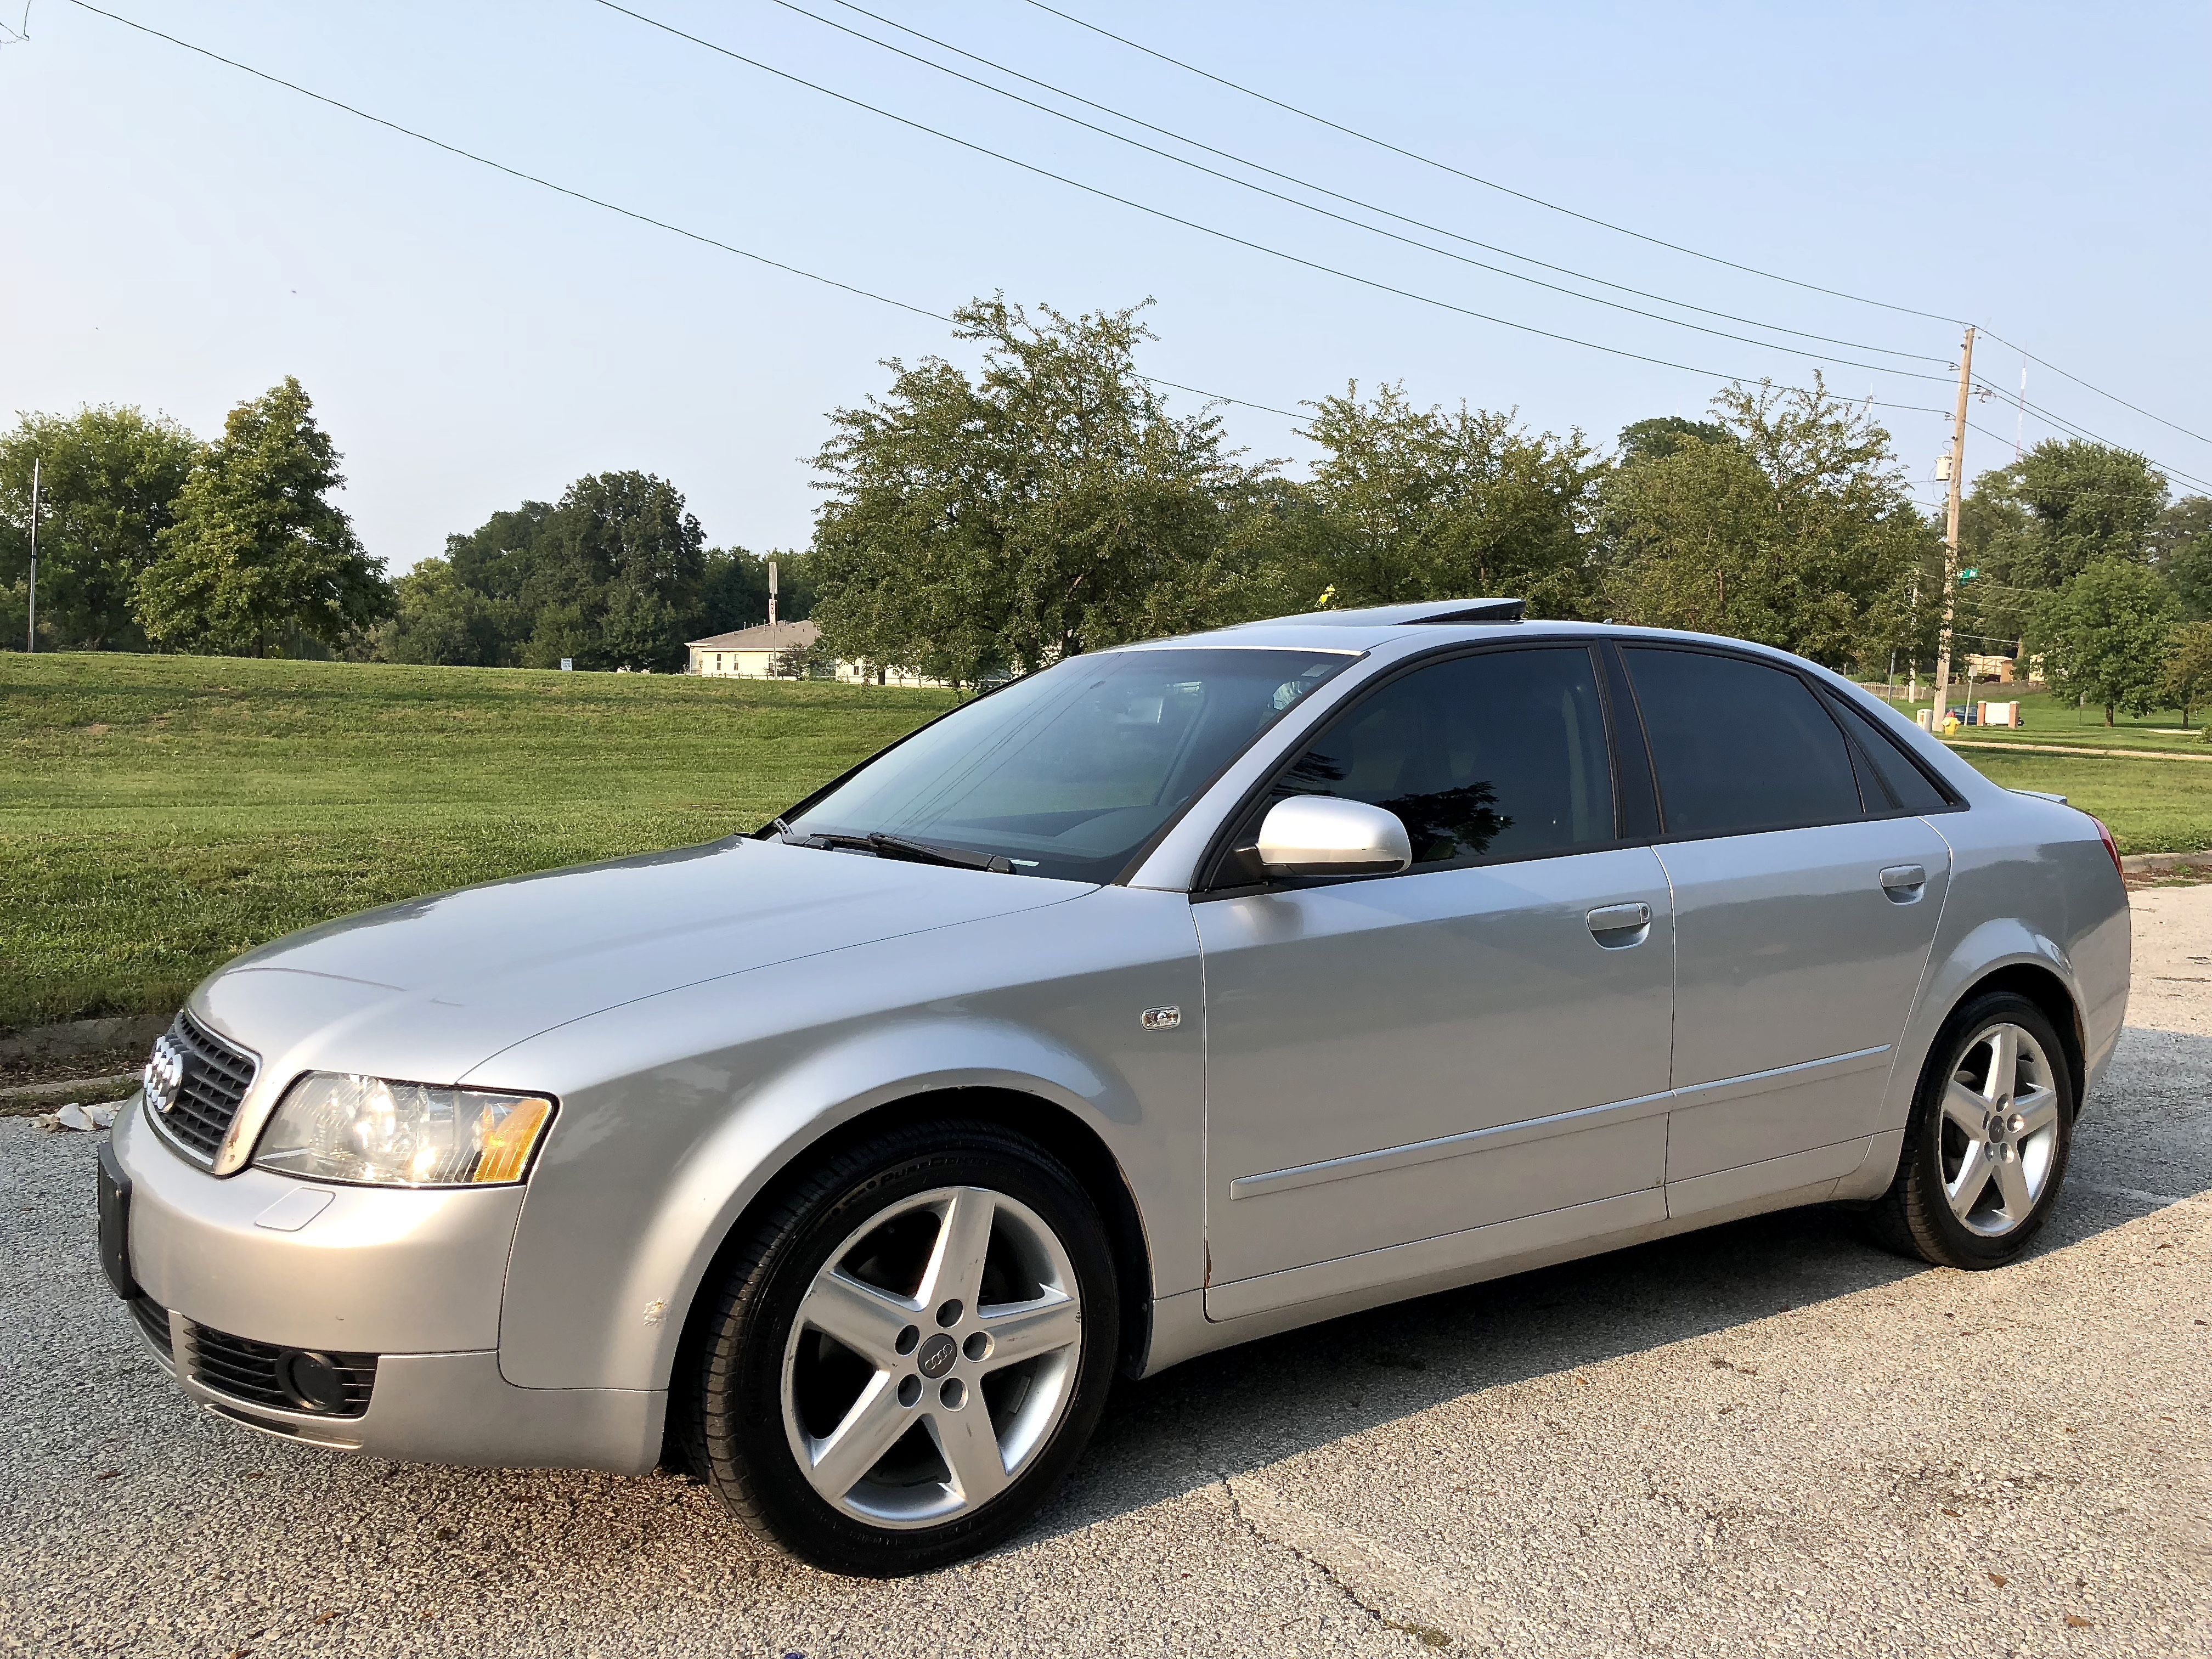 Bmw Dealership Houston New Car Release Information